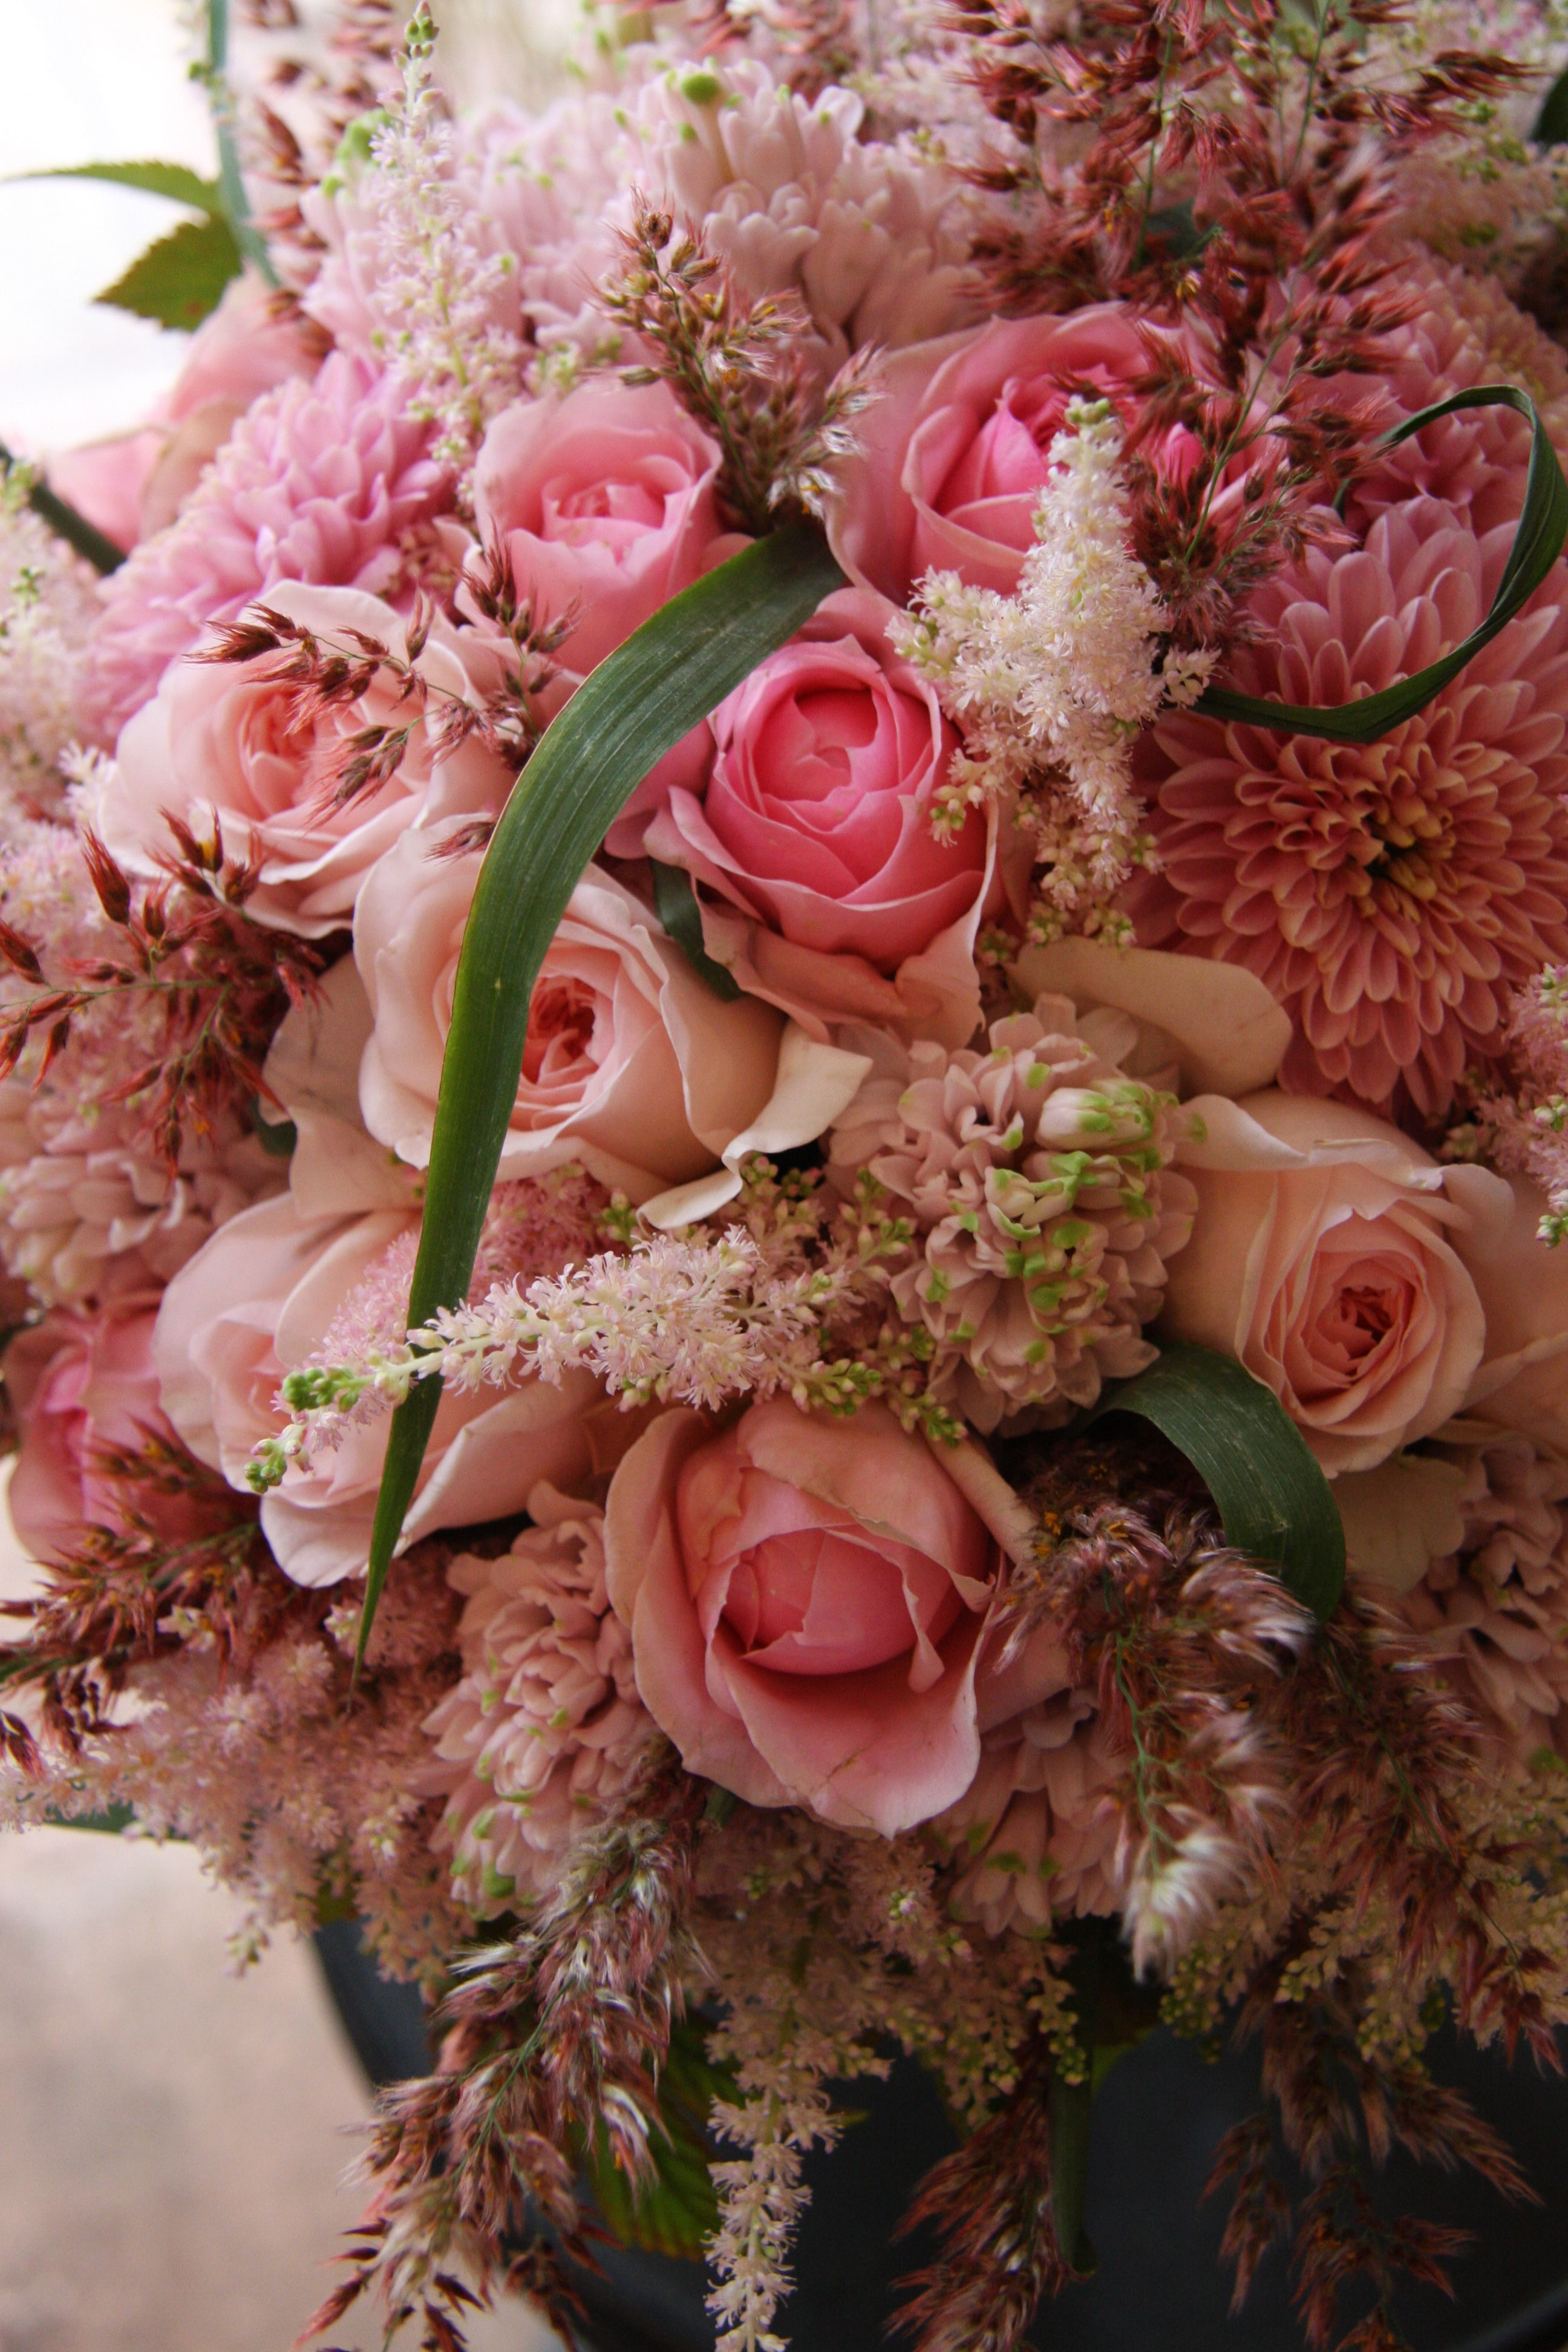 Rose hyacinthrysanthemum flower arrangements pinterest